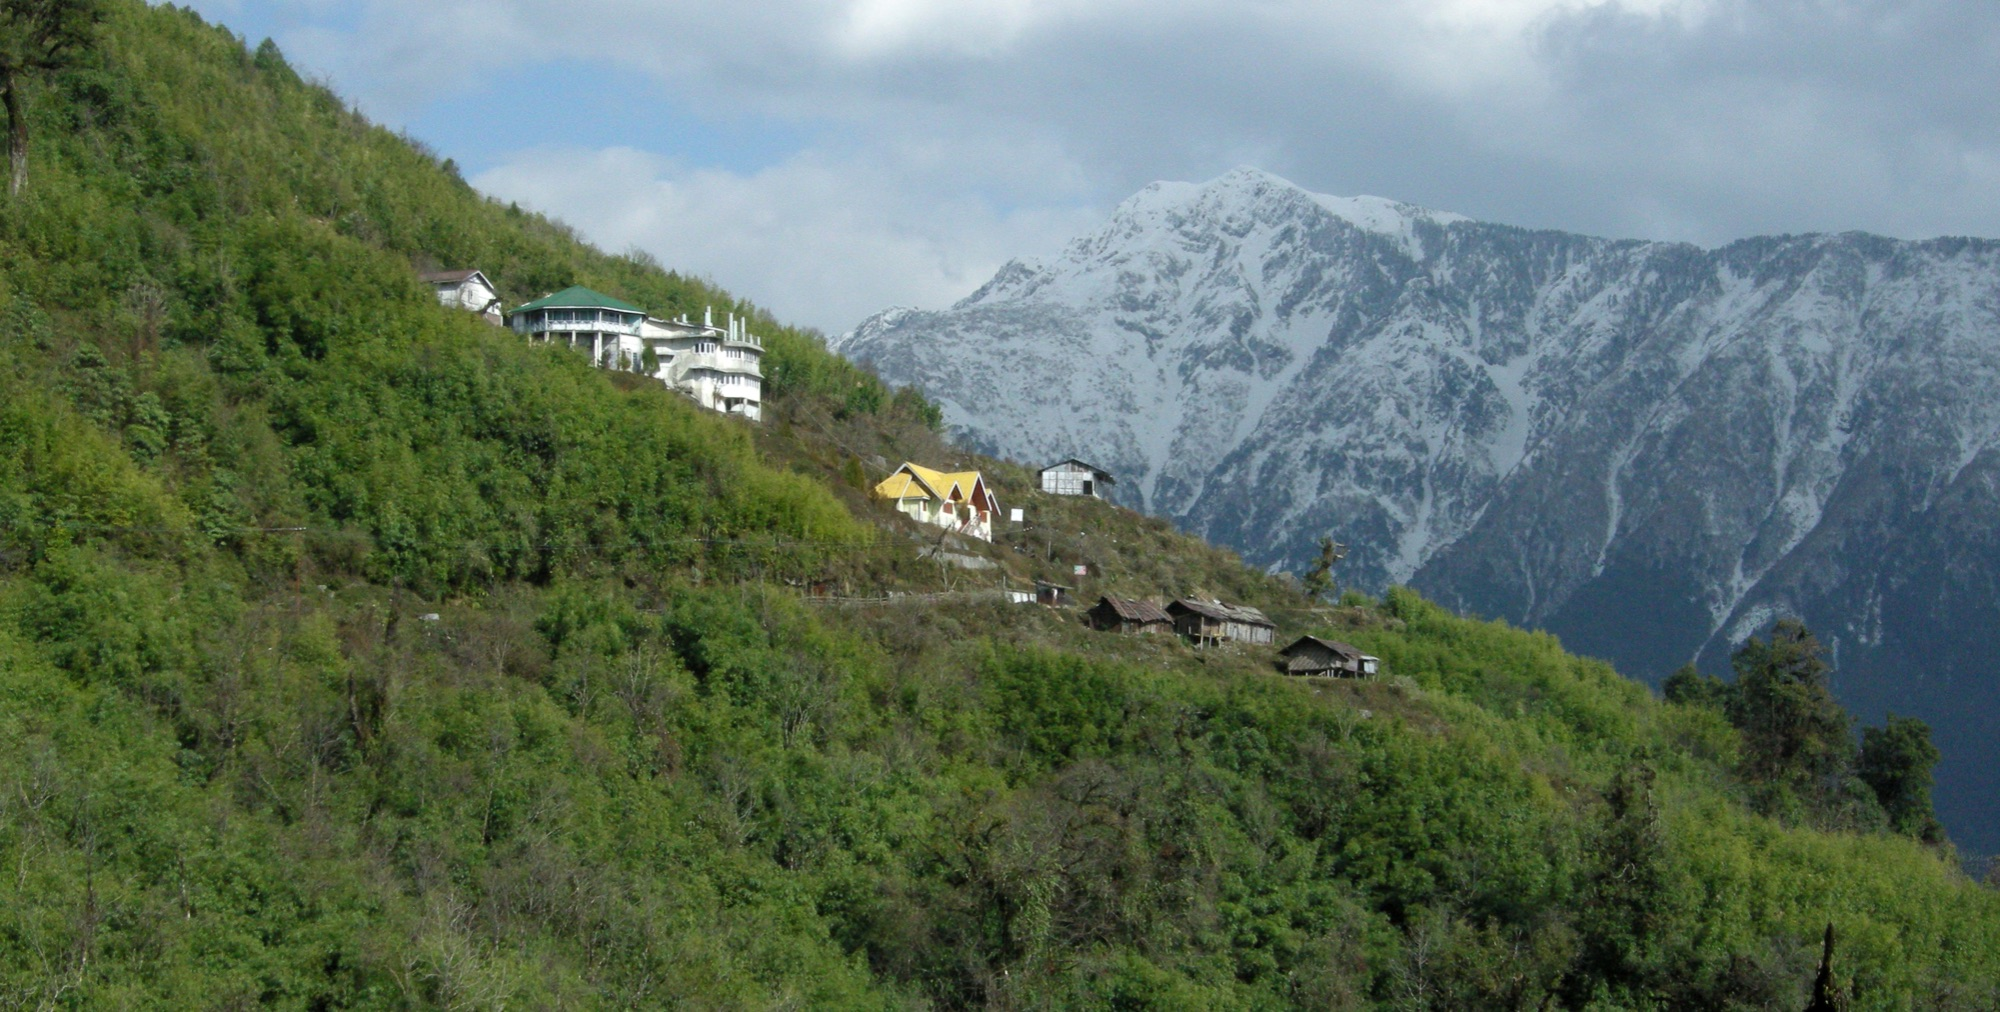 mayodia rest house, mishmi hills